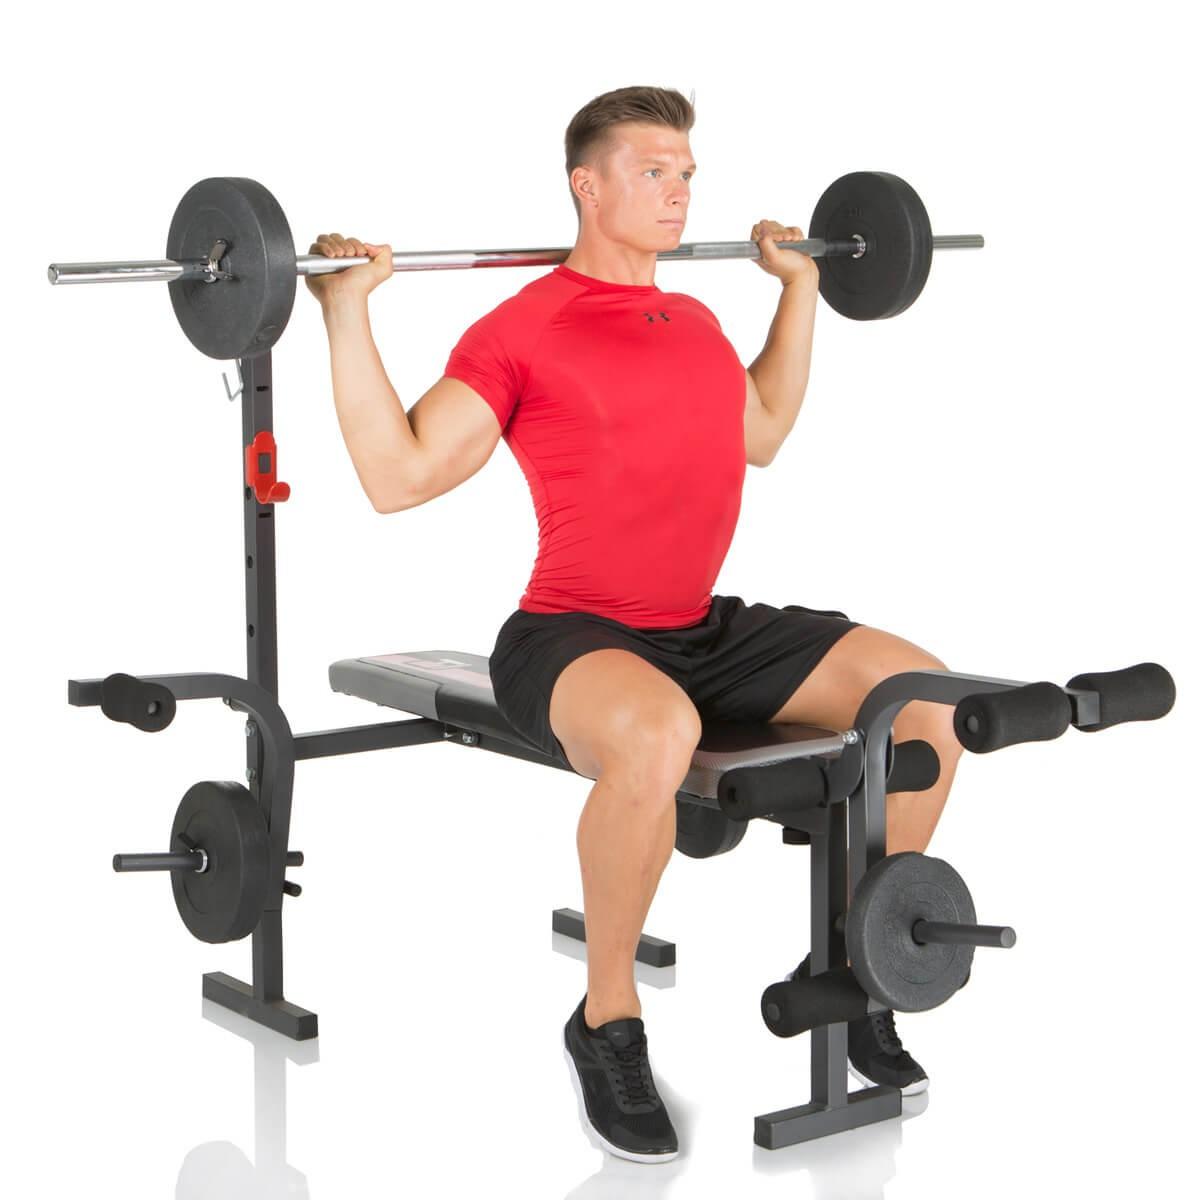 Buy Hammer Weight Bench Bermuda Incl 25 Kg Weights